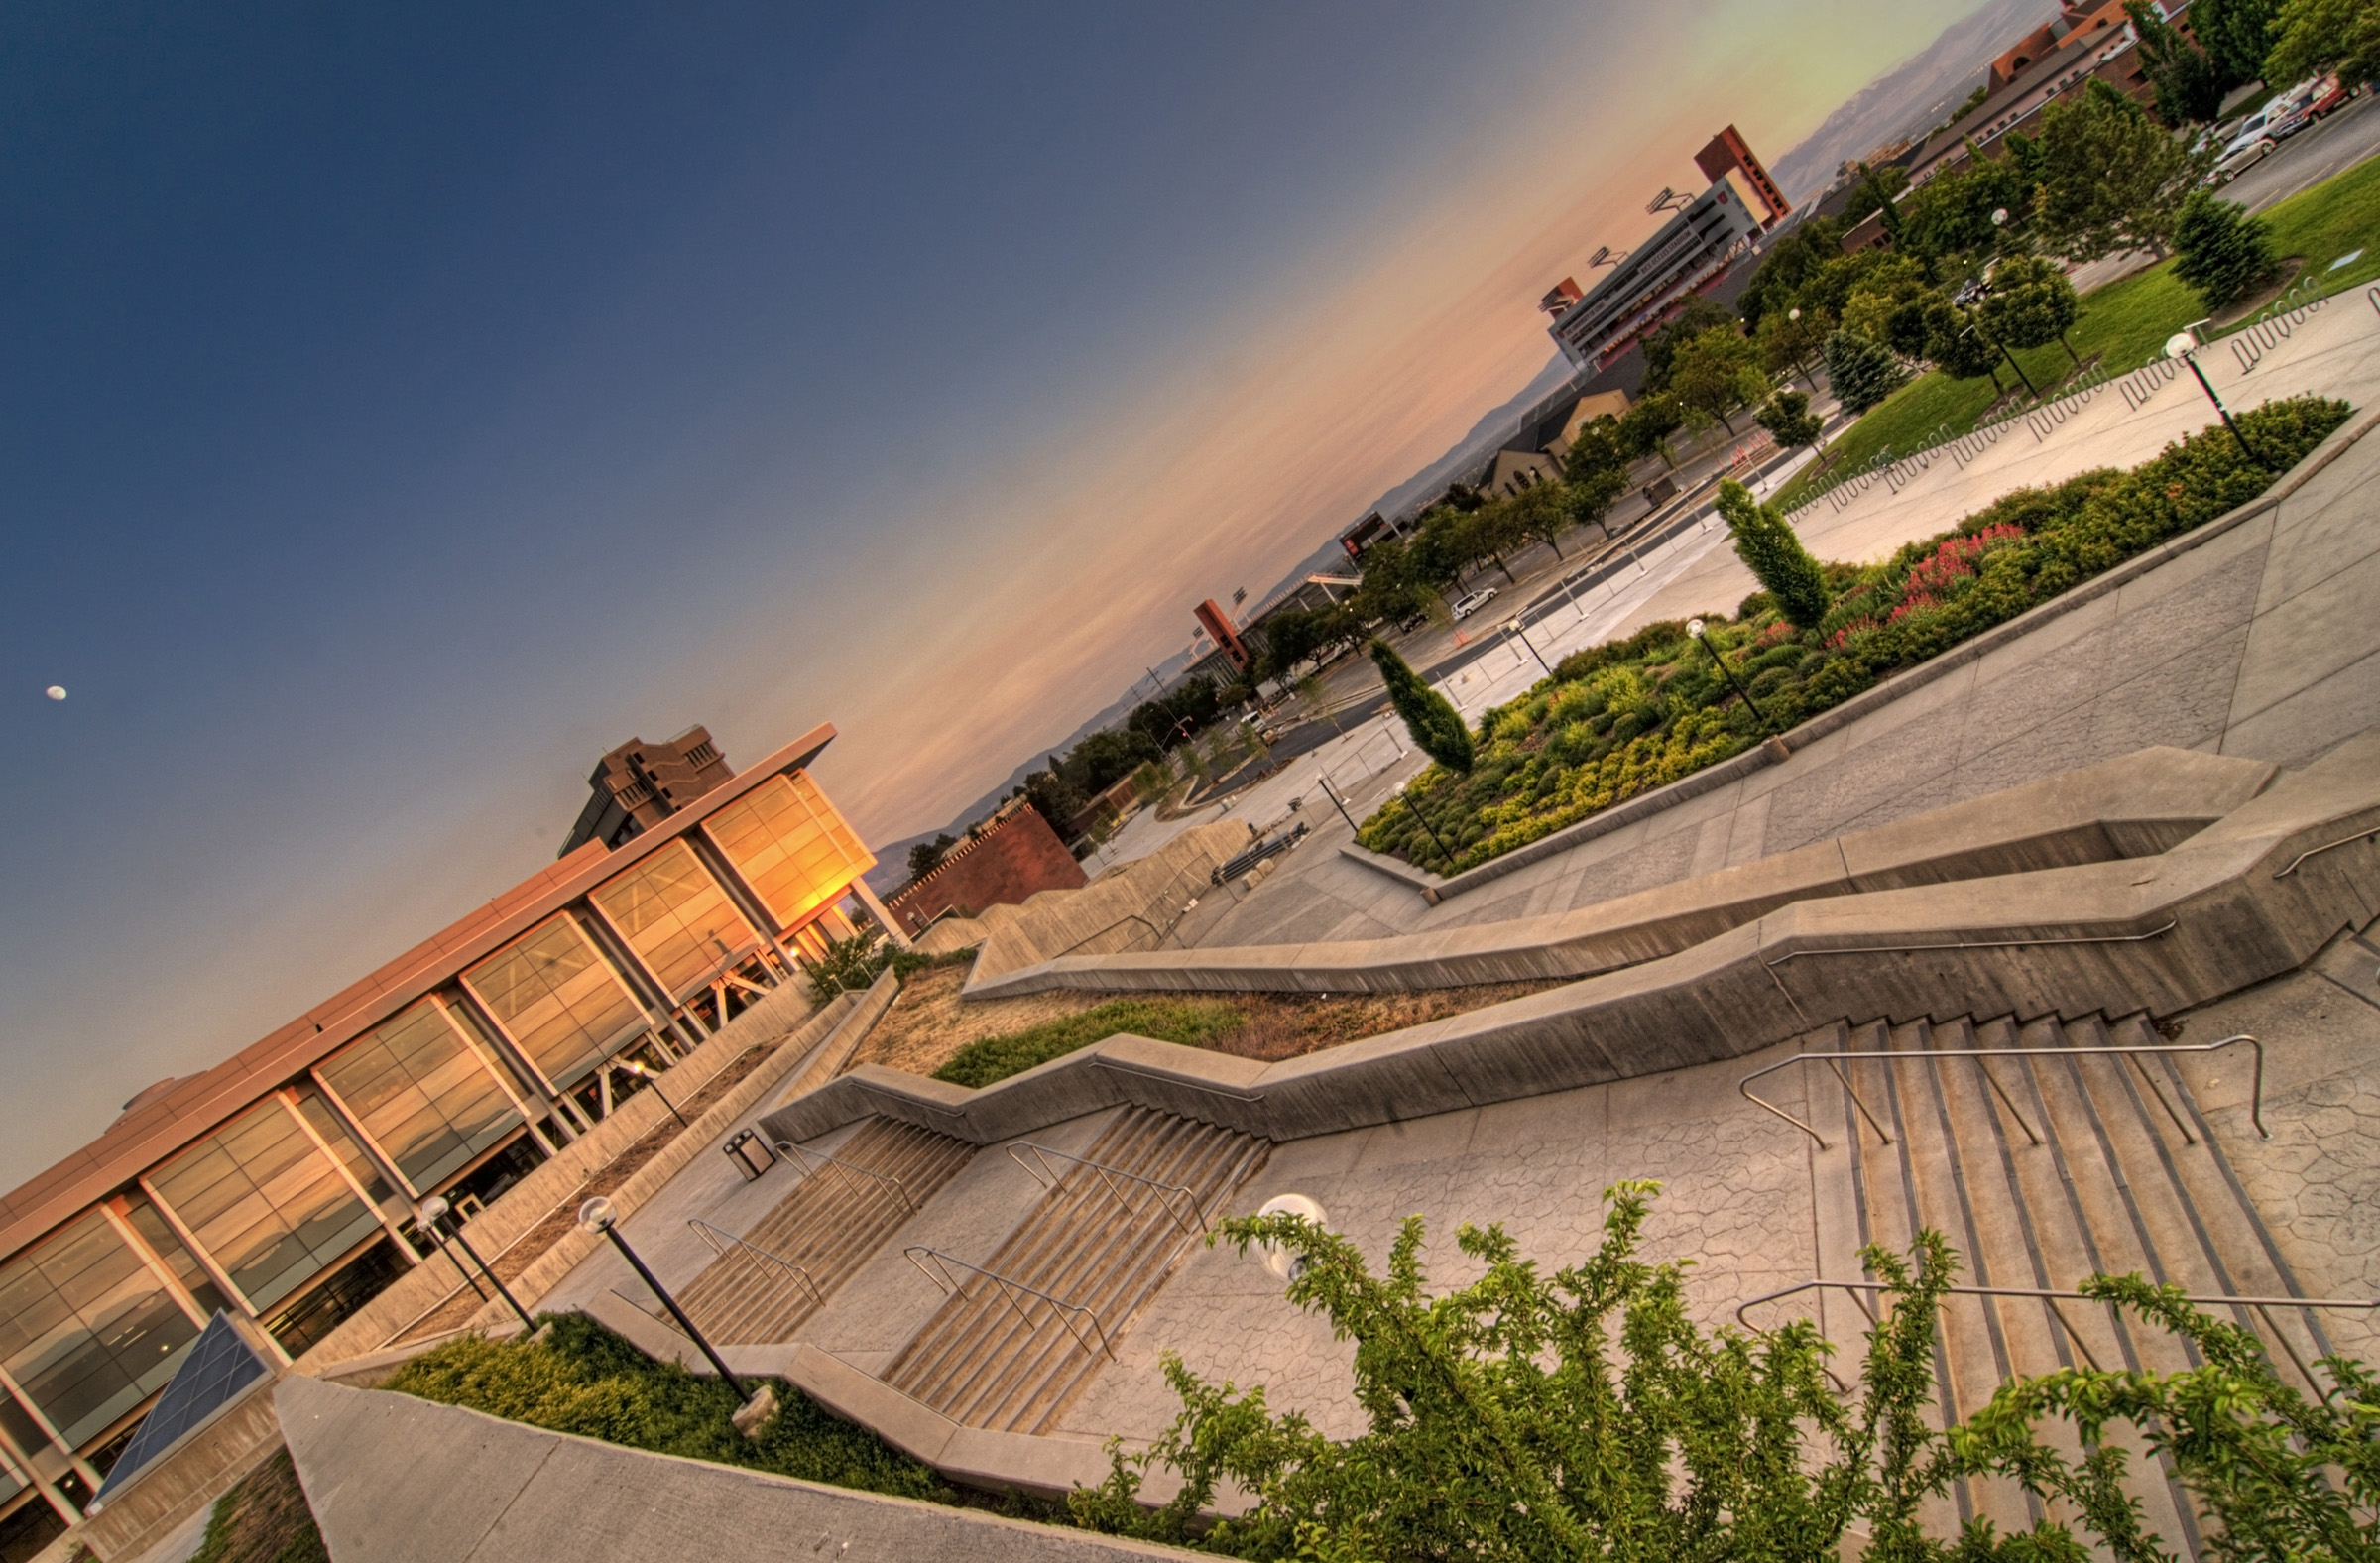 J. Willard Marriot Library and Rice Eccles Stadium at dusk, the University of Utah.